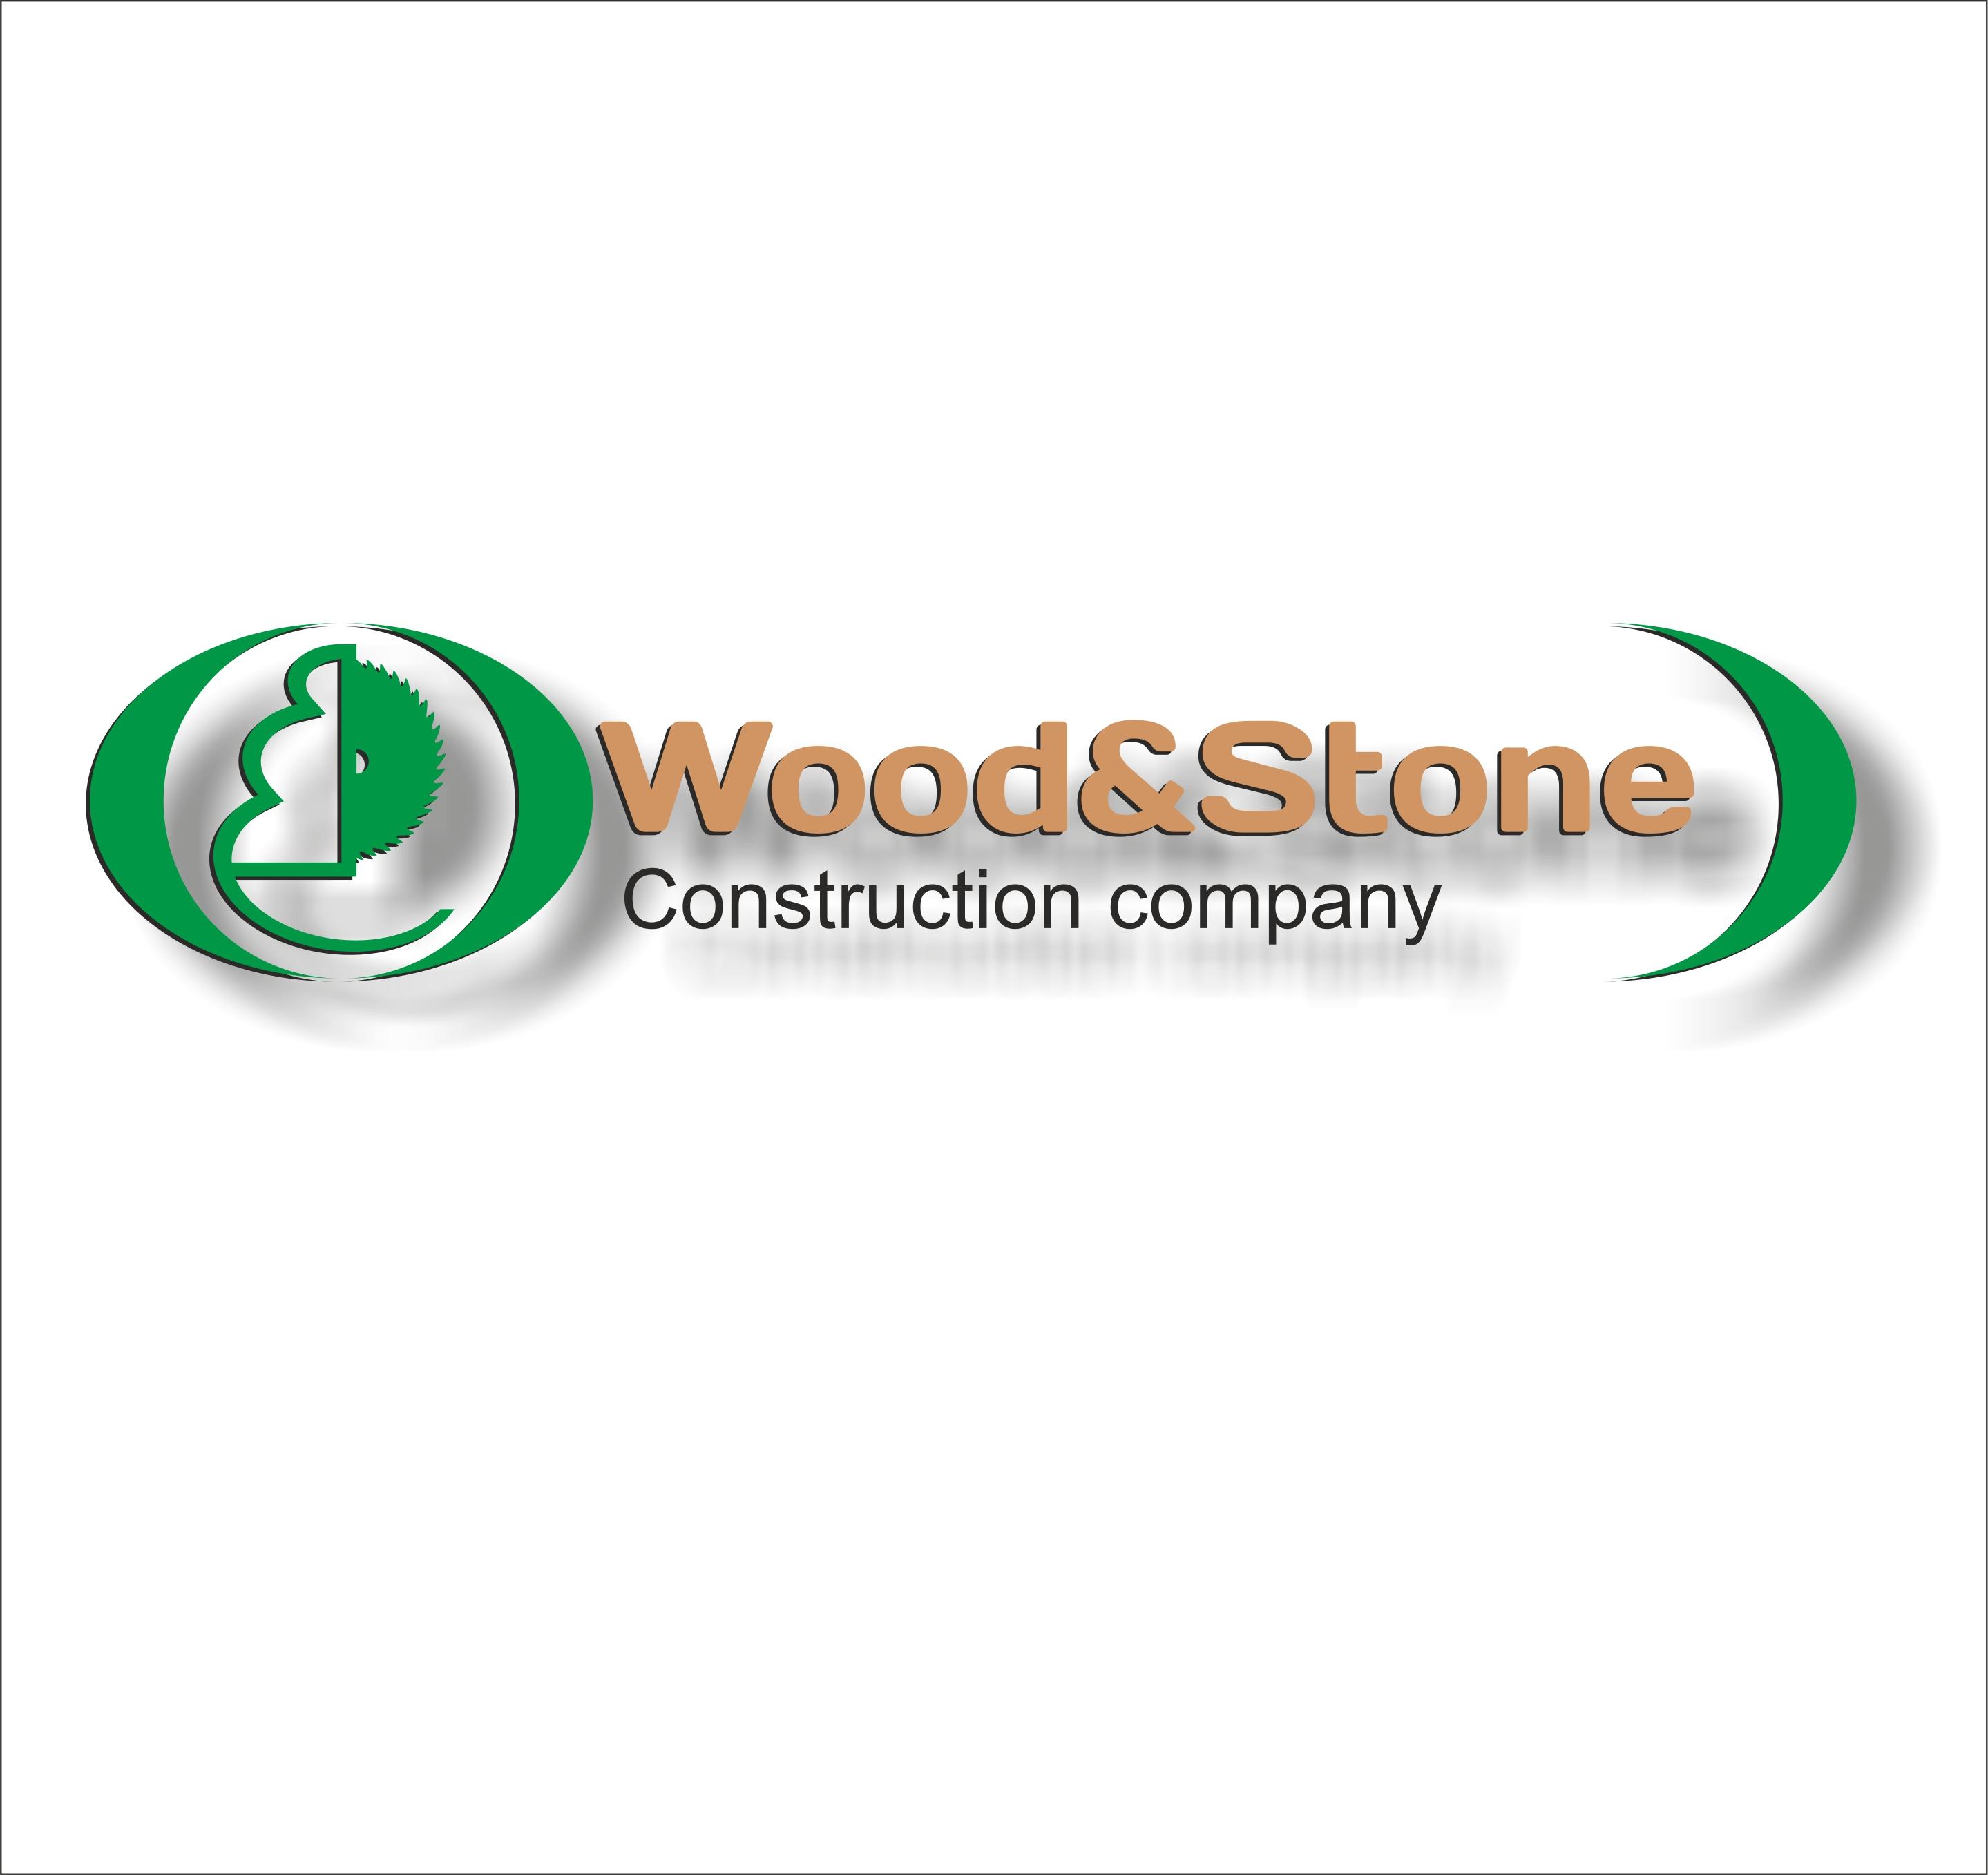 Логотип и Фирменный стиль фото f_9475497c5c846f23.jpg